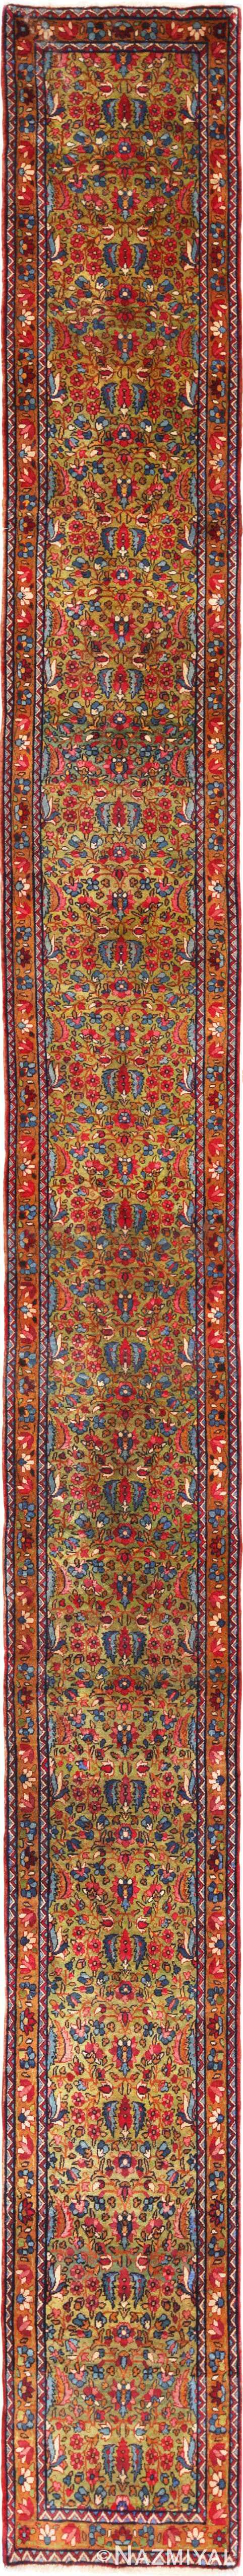 Beautiful Antique Persian Kerman Runner Rug 70165 By Nazmiyal Rug Runner Rugs Antique Runner